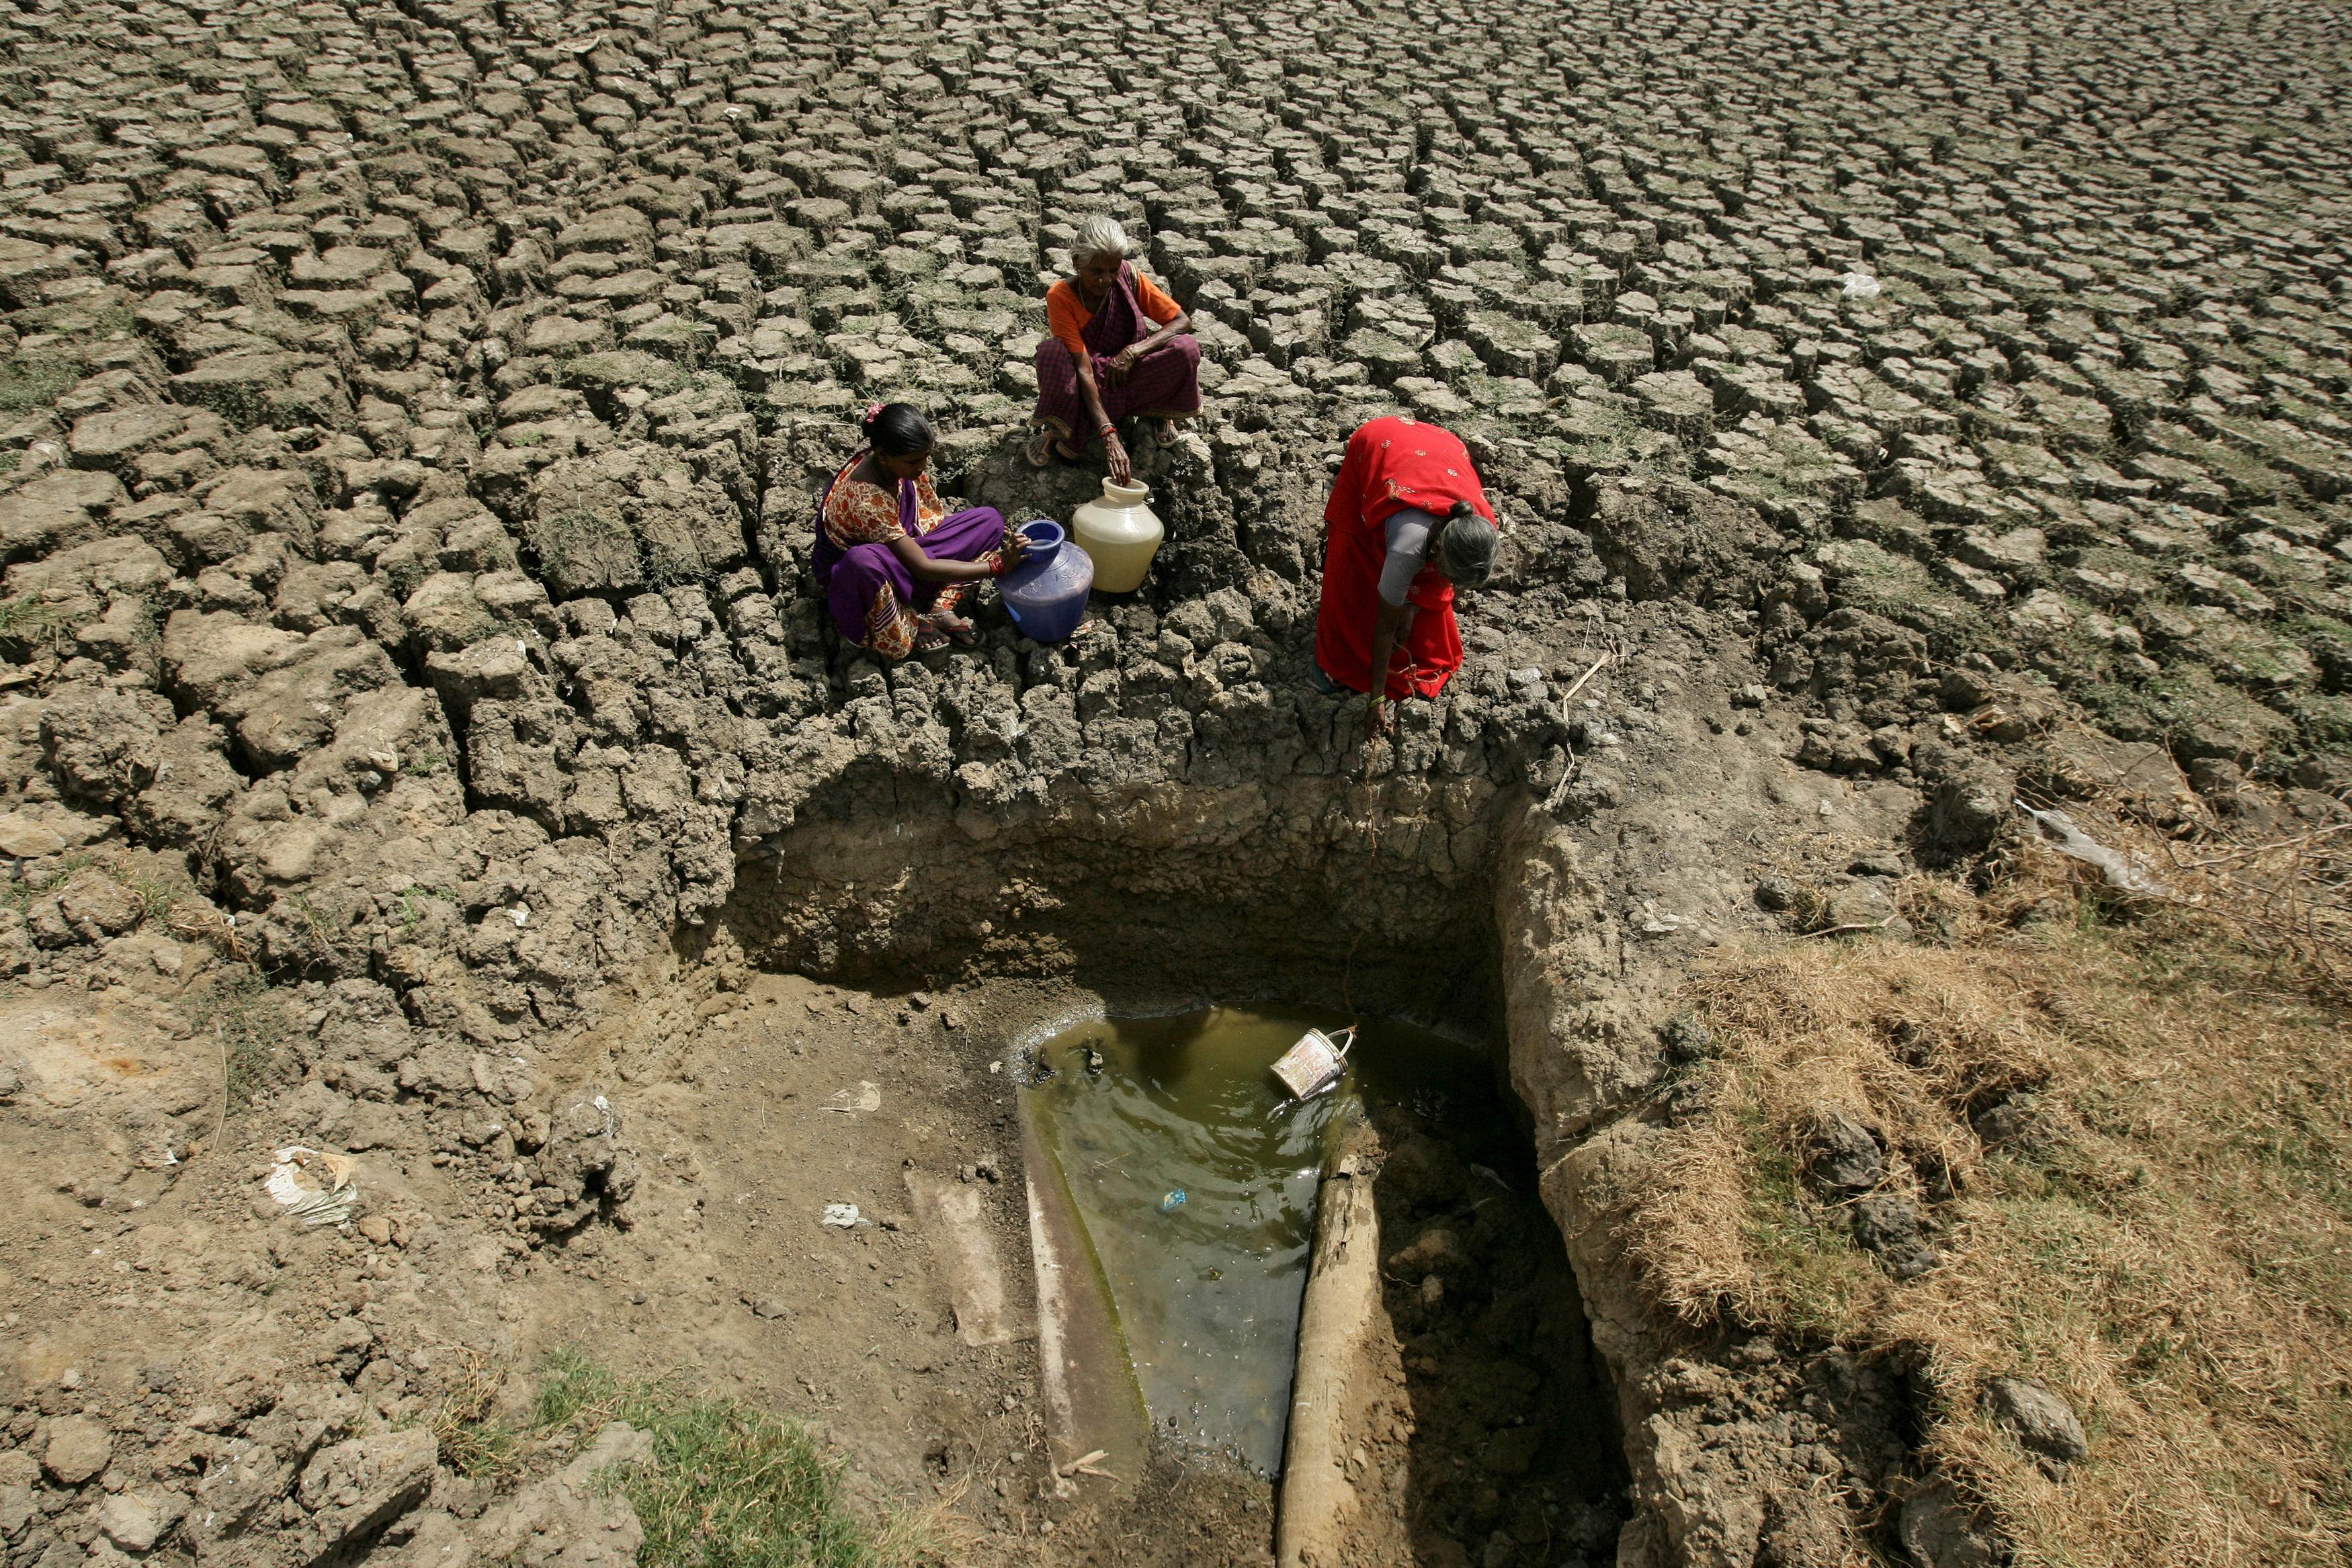 India, pianeta Terra: senza più acqua